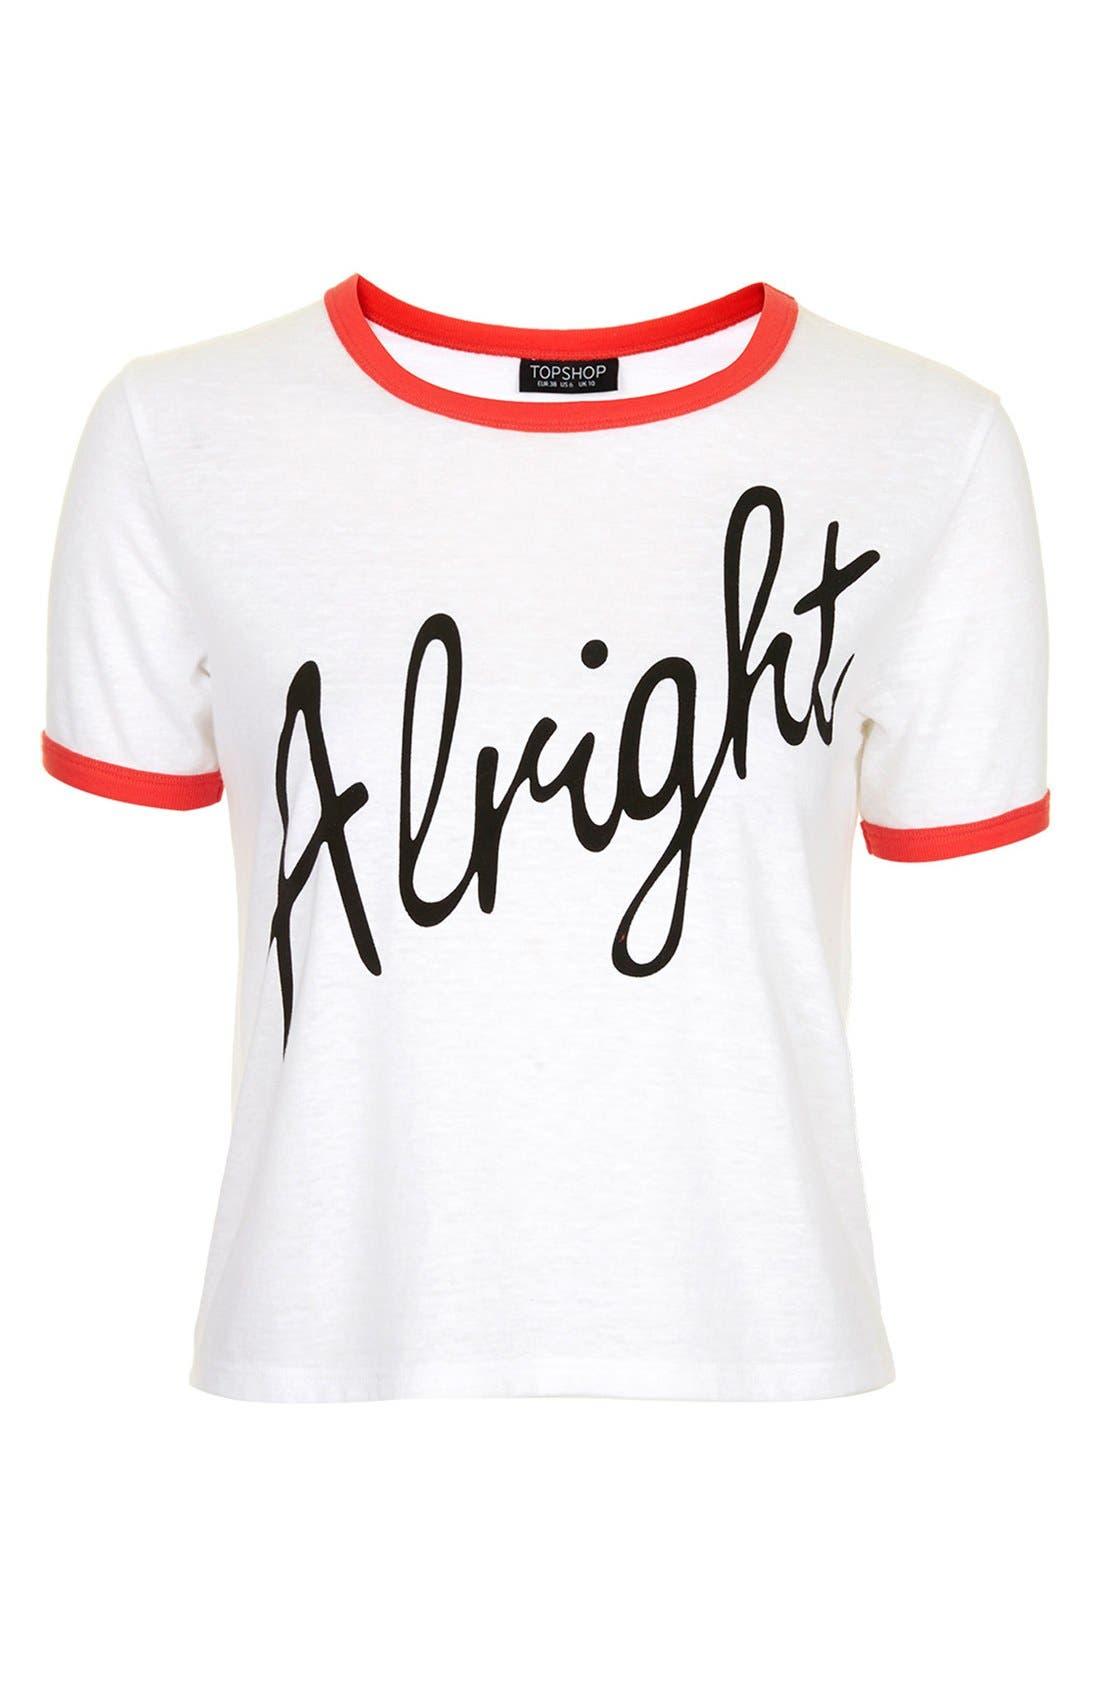 Alternate Image 5  - Topshop 'Alright' Tee (Brit Pop-In) (Nordstrom Exclusive)